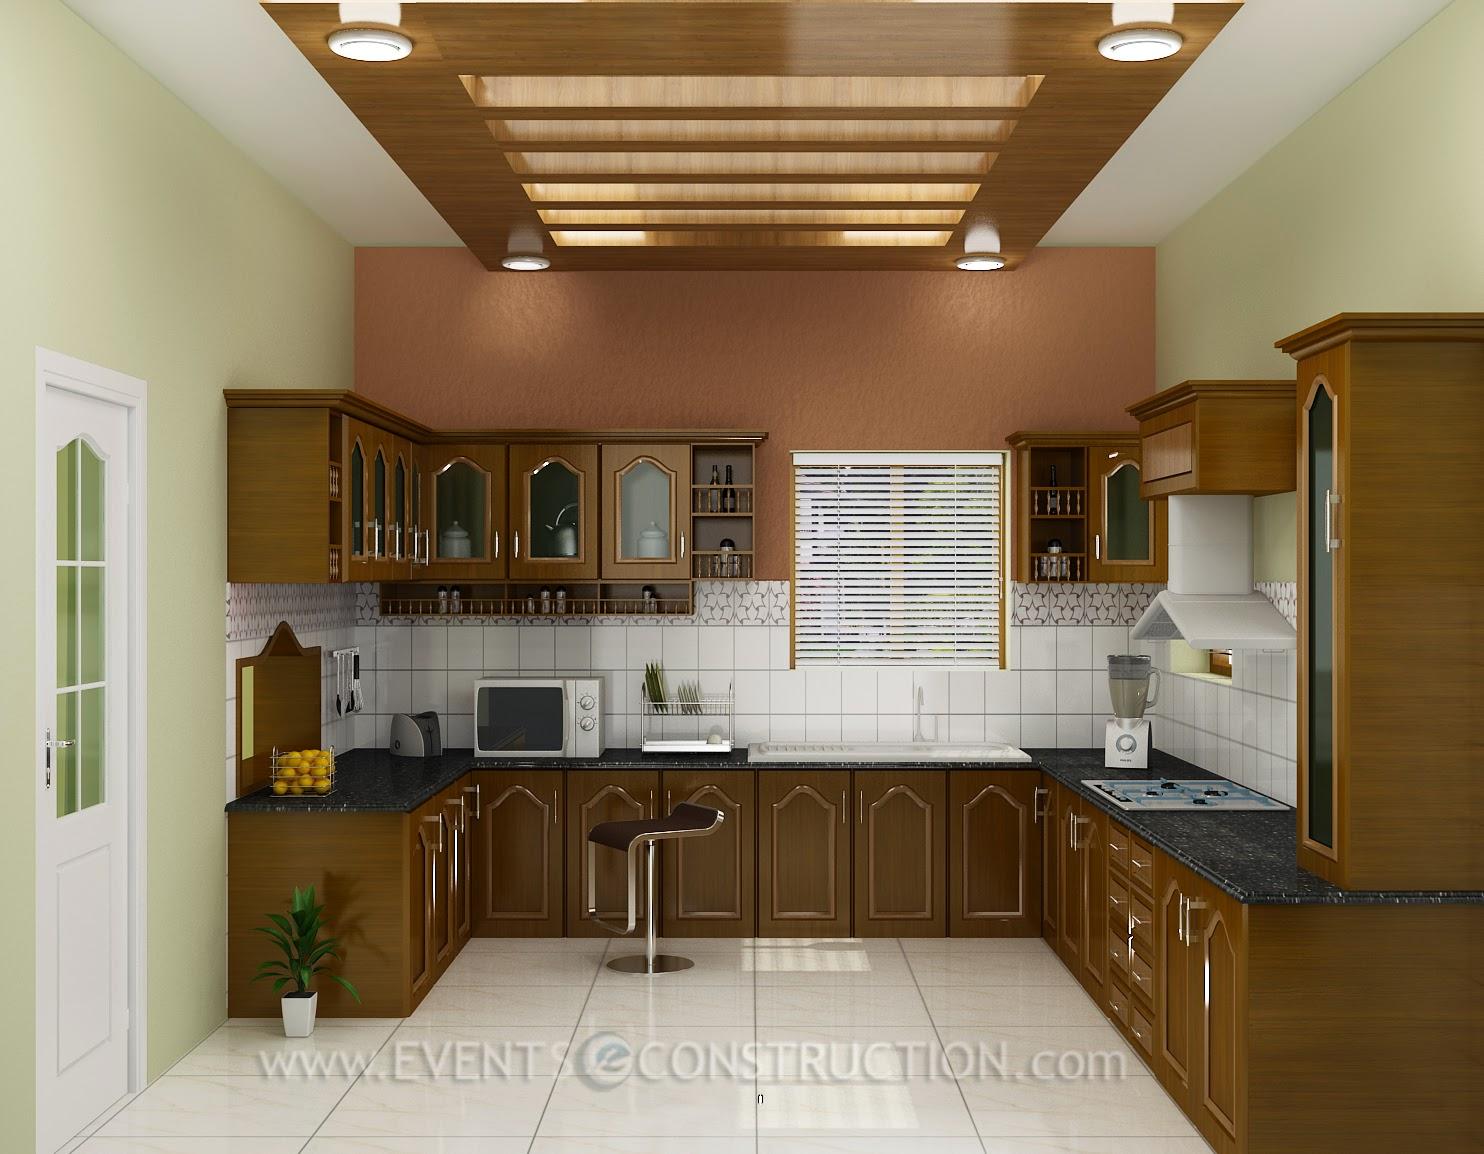 evens construction pvt ltd kerala kitchen interior design. Black Bedroom Furniture Sets. Home Design Ideas